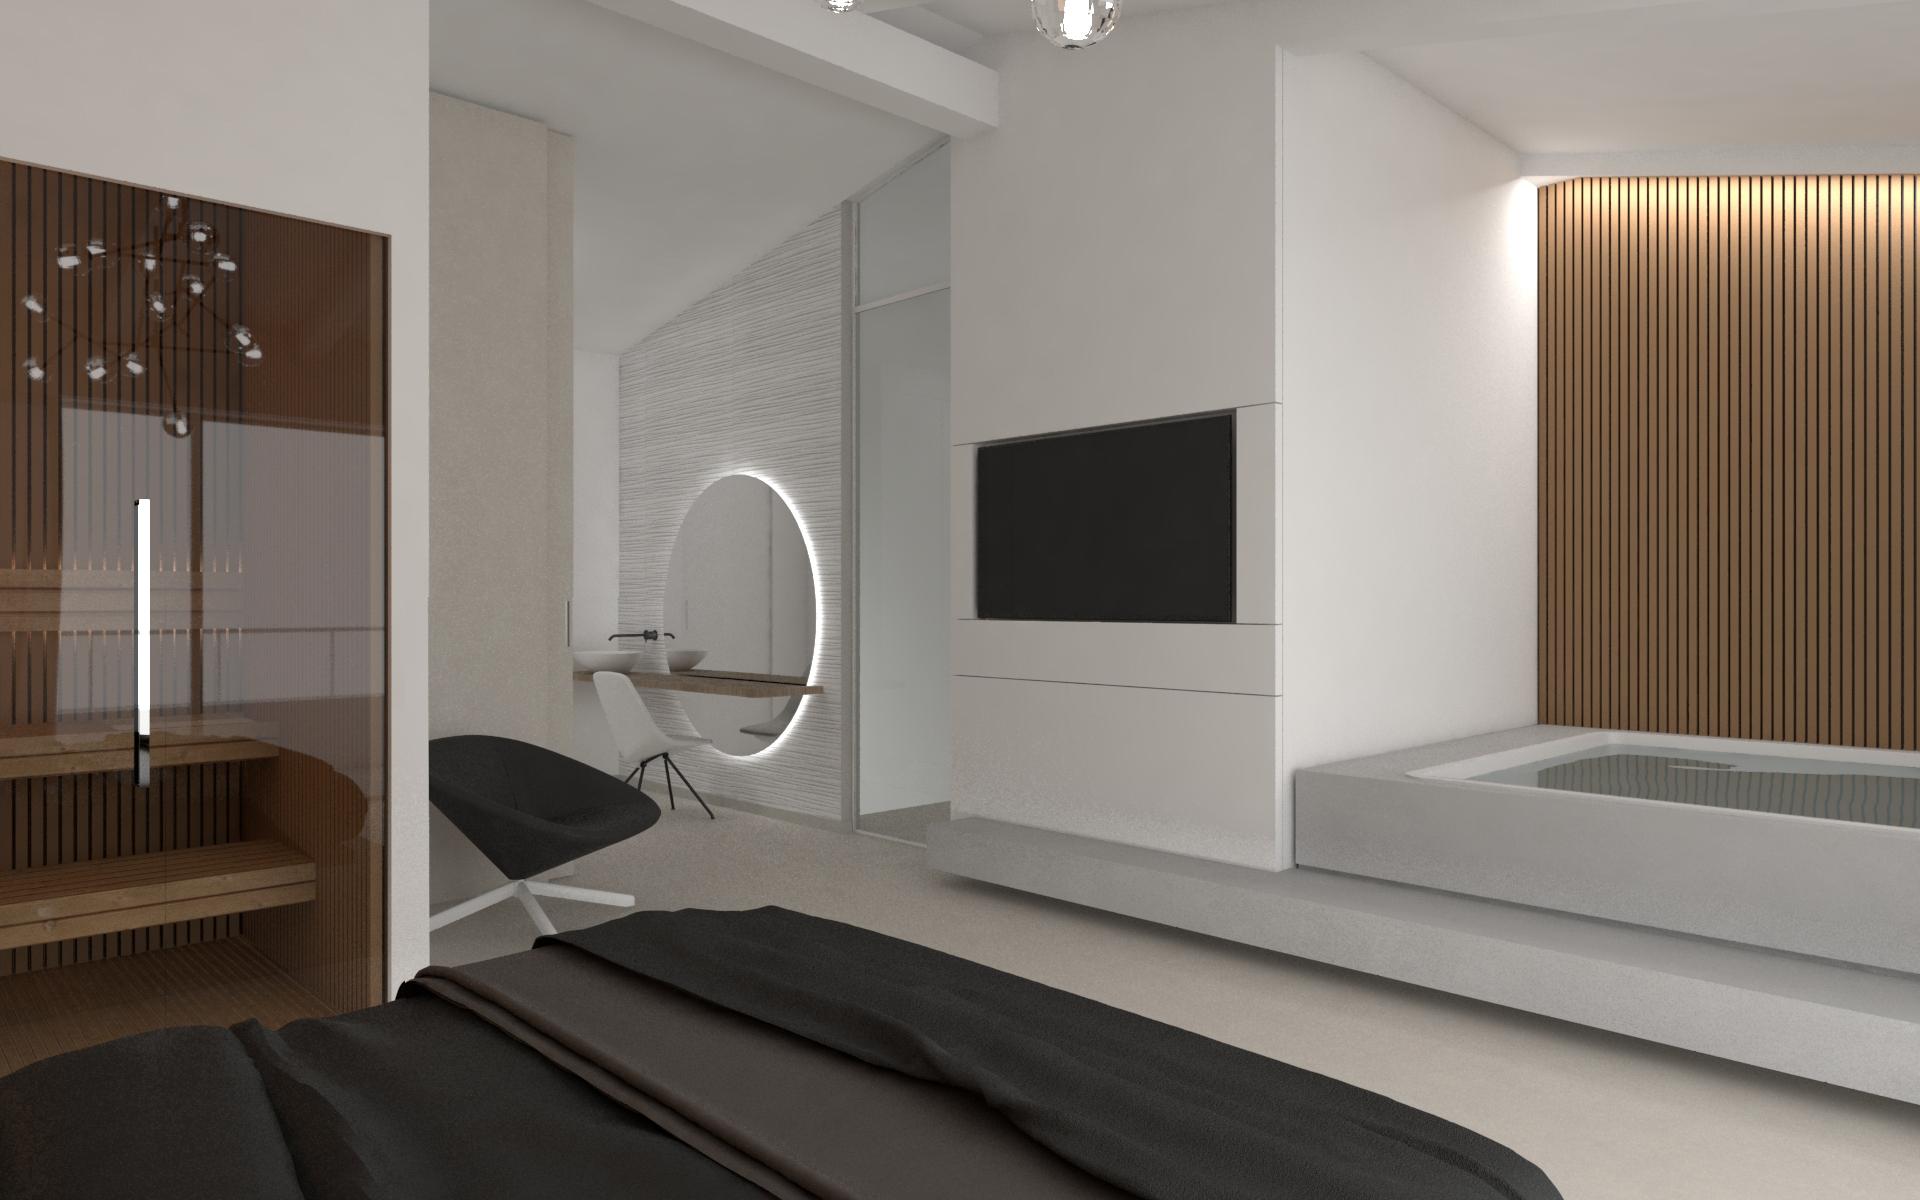 Casa-MR-_-DFG-Architetti-Associati-6